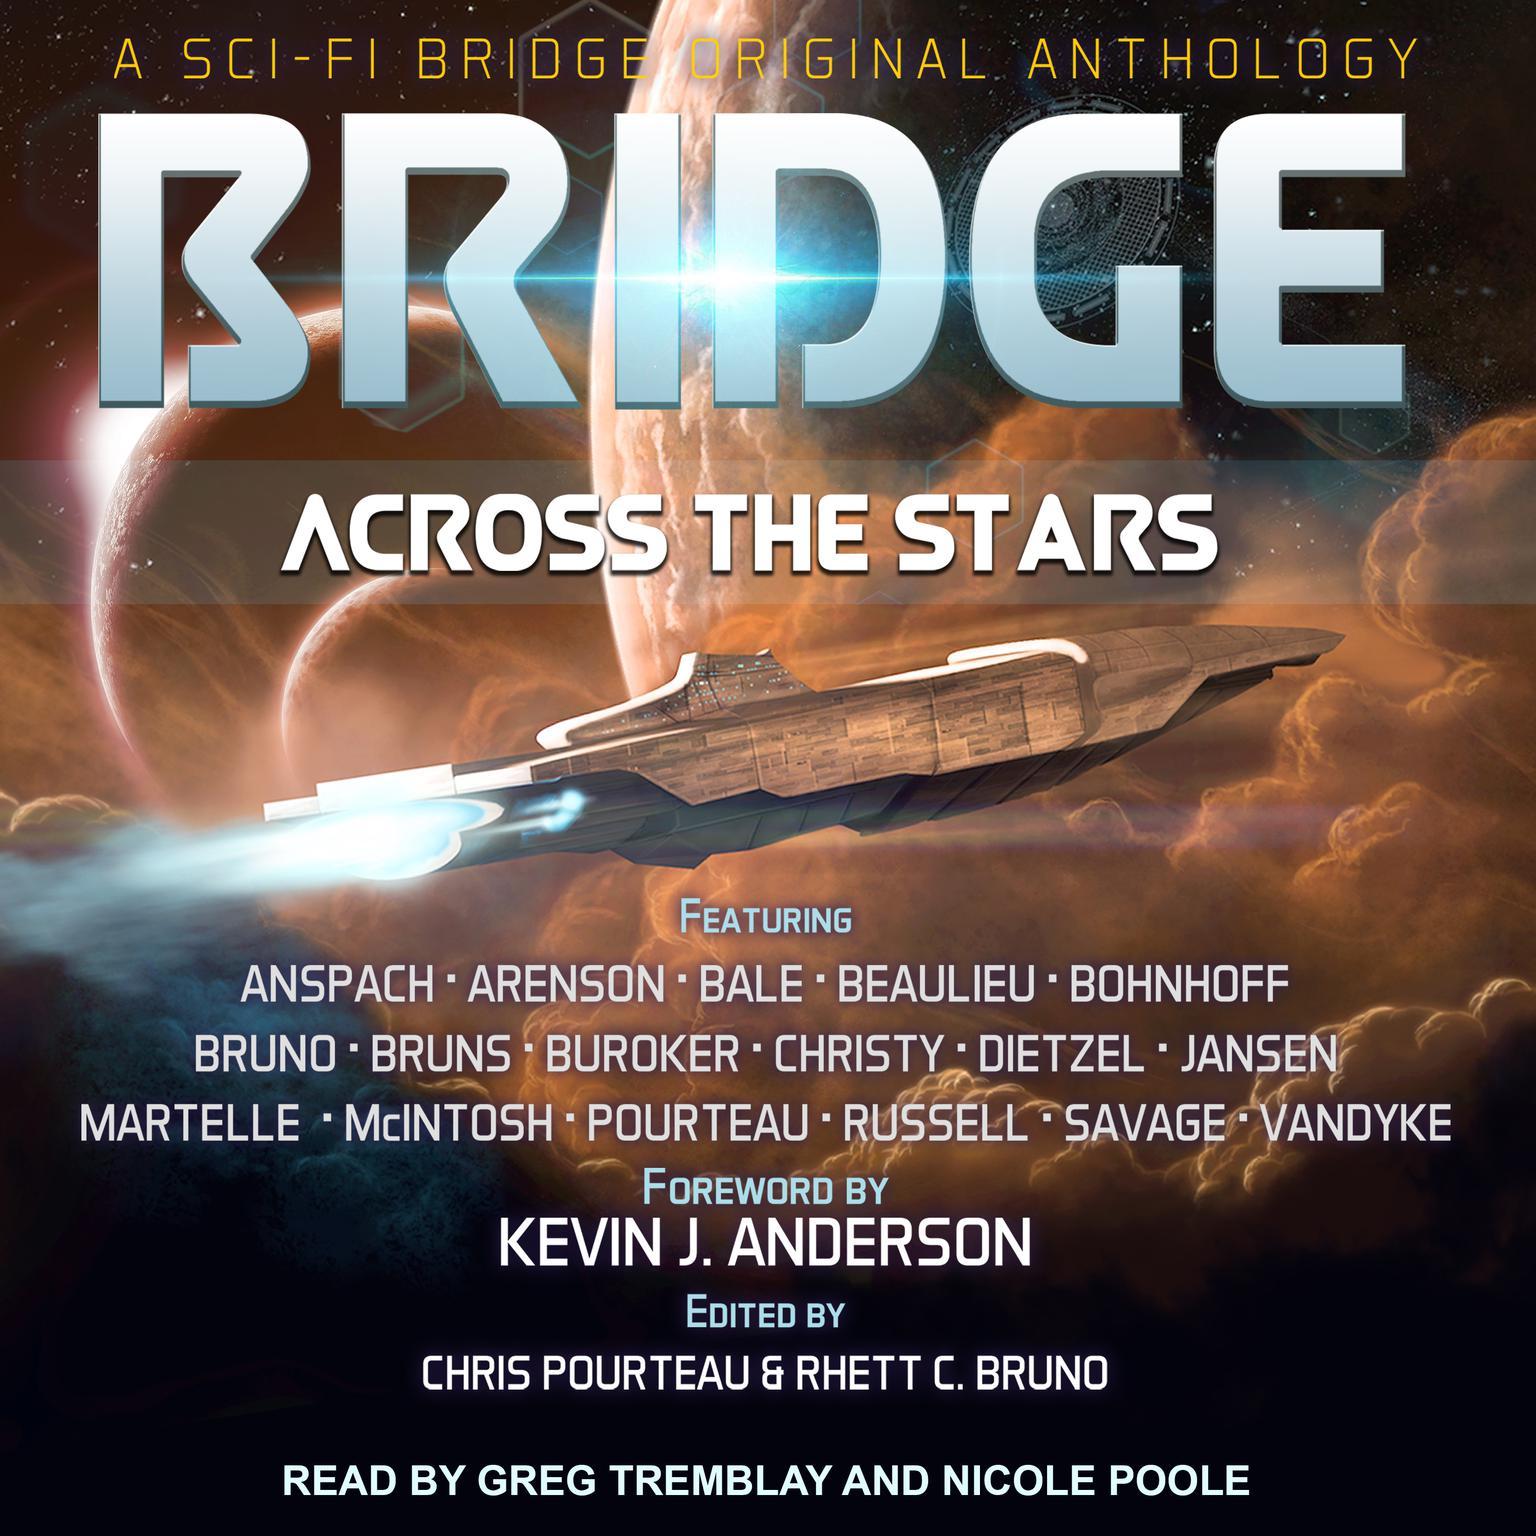 Printable Bridge Across the Stars: A Sci-Fi Bridge Original Anthology Audiobook Cover Art